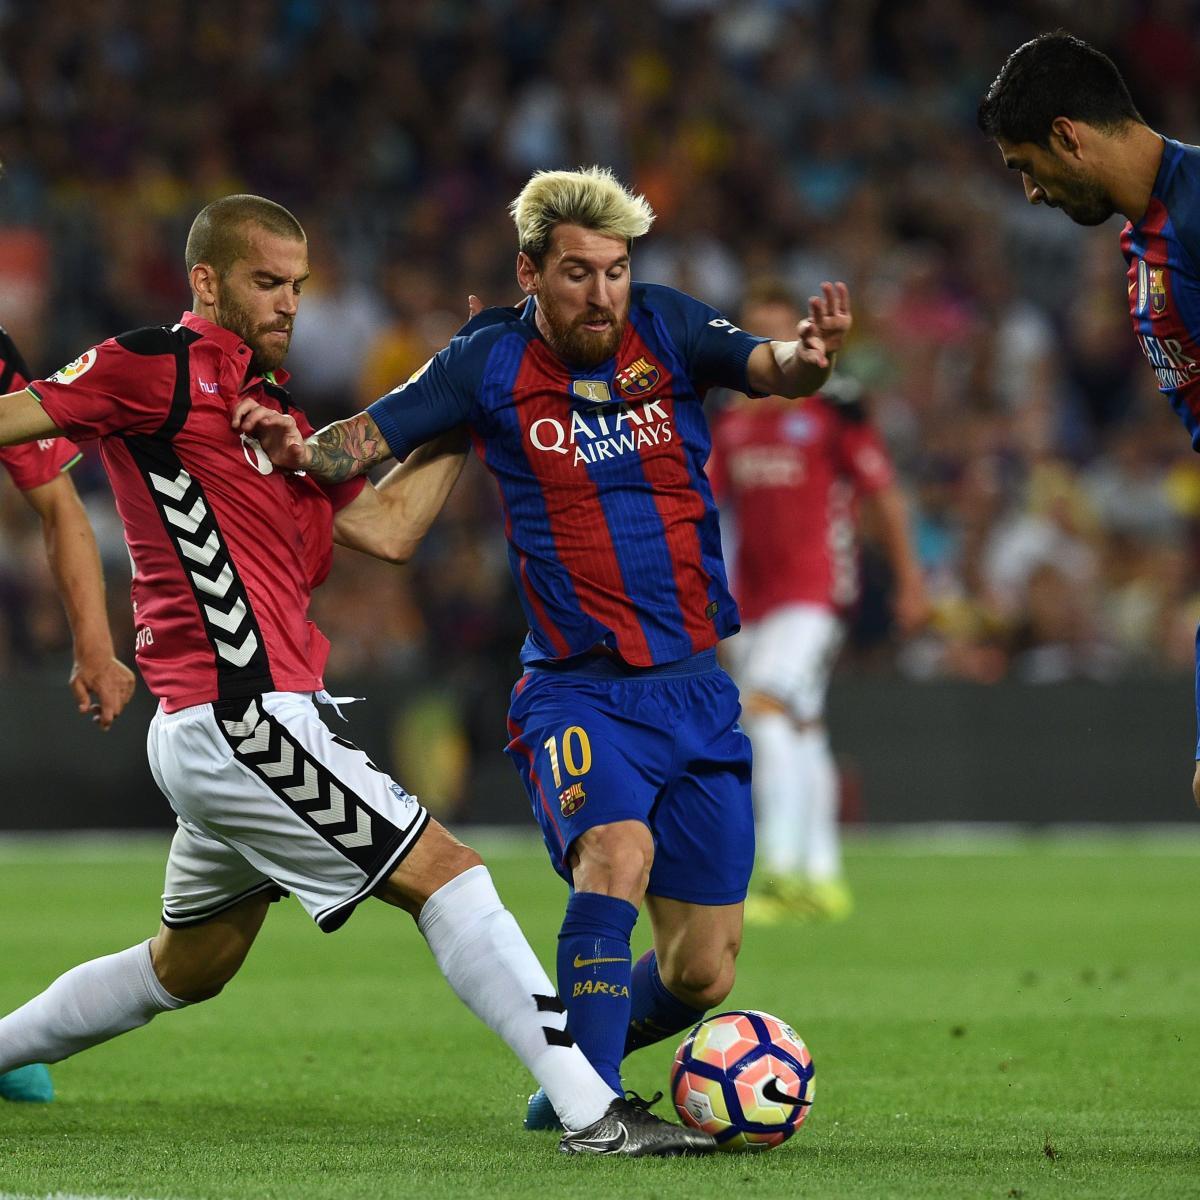 Celta Vigo Vs Barcelona Live Commentary: Alaves Vs. Barcelona: Team News, Preview, Live Stream And